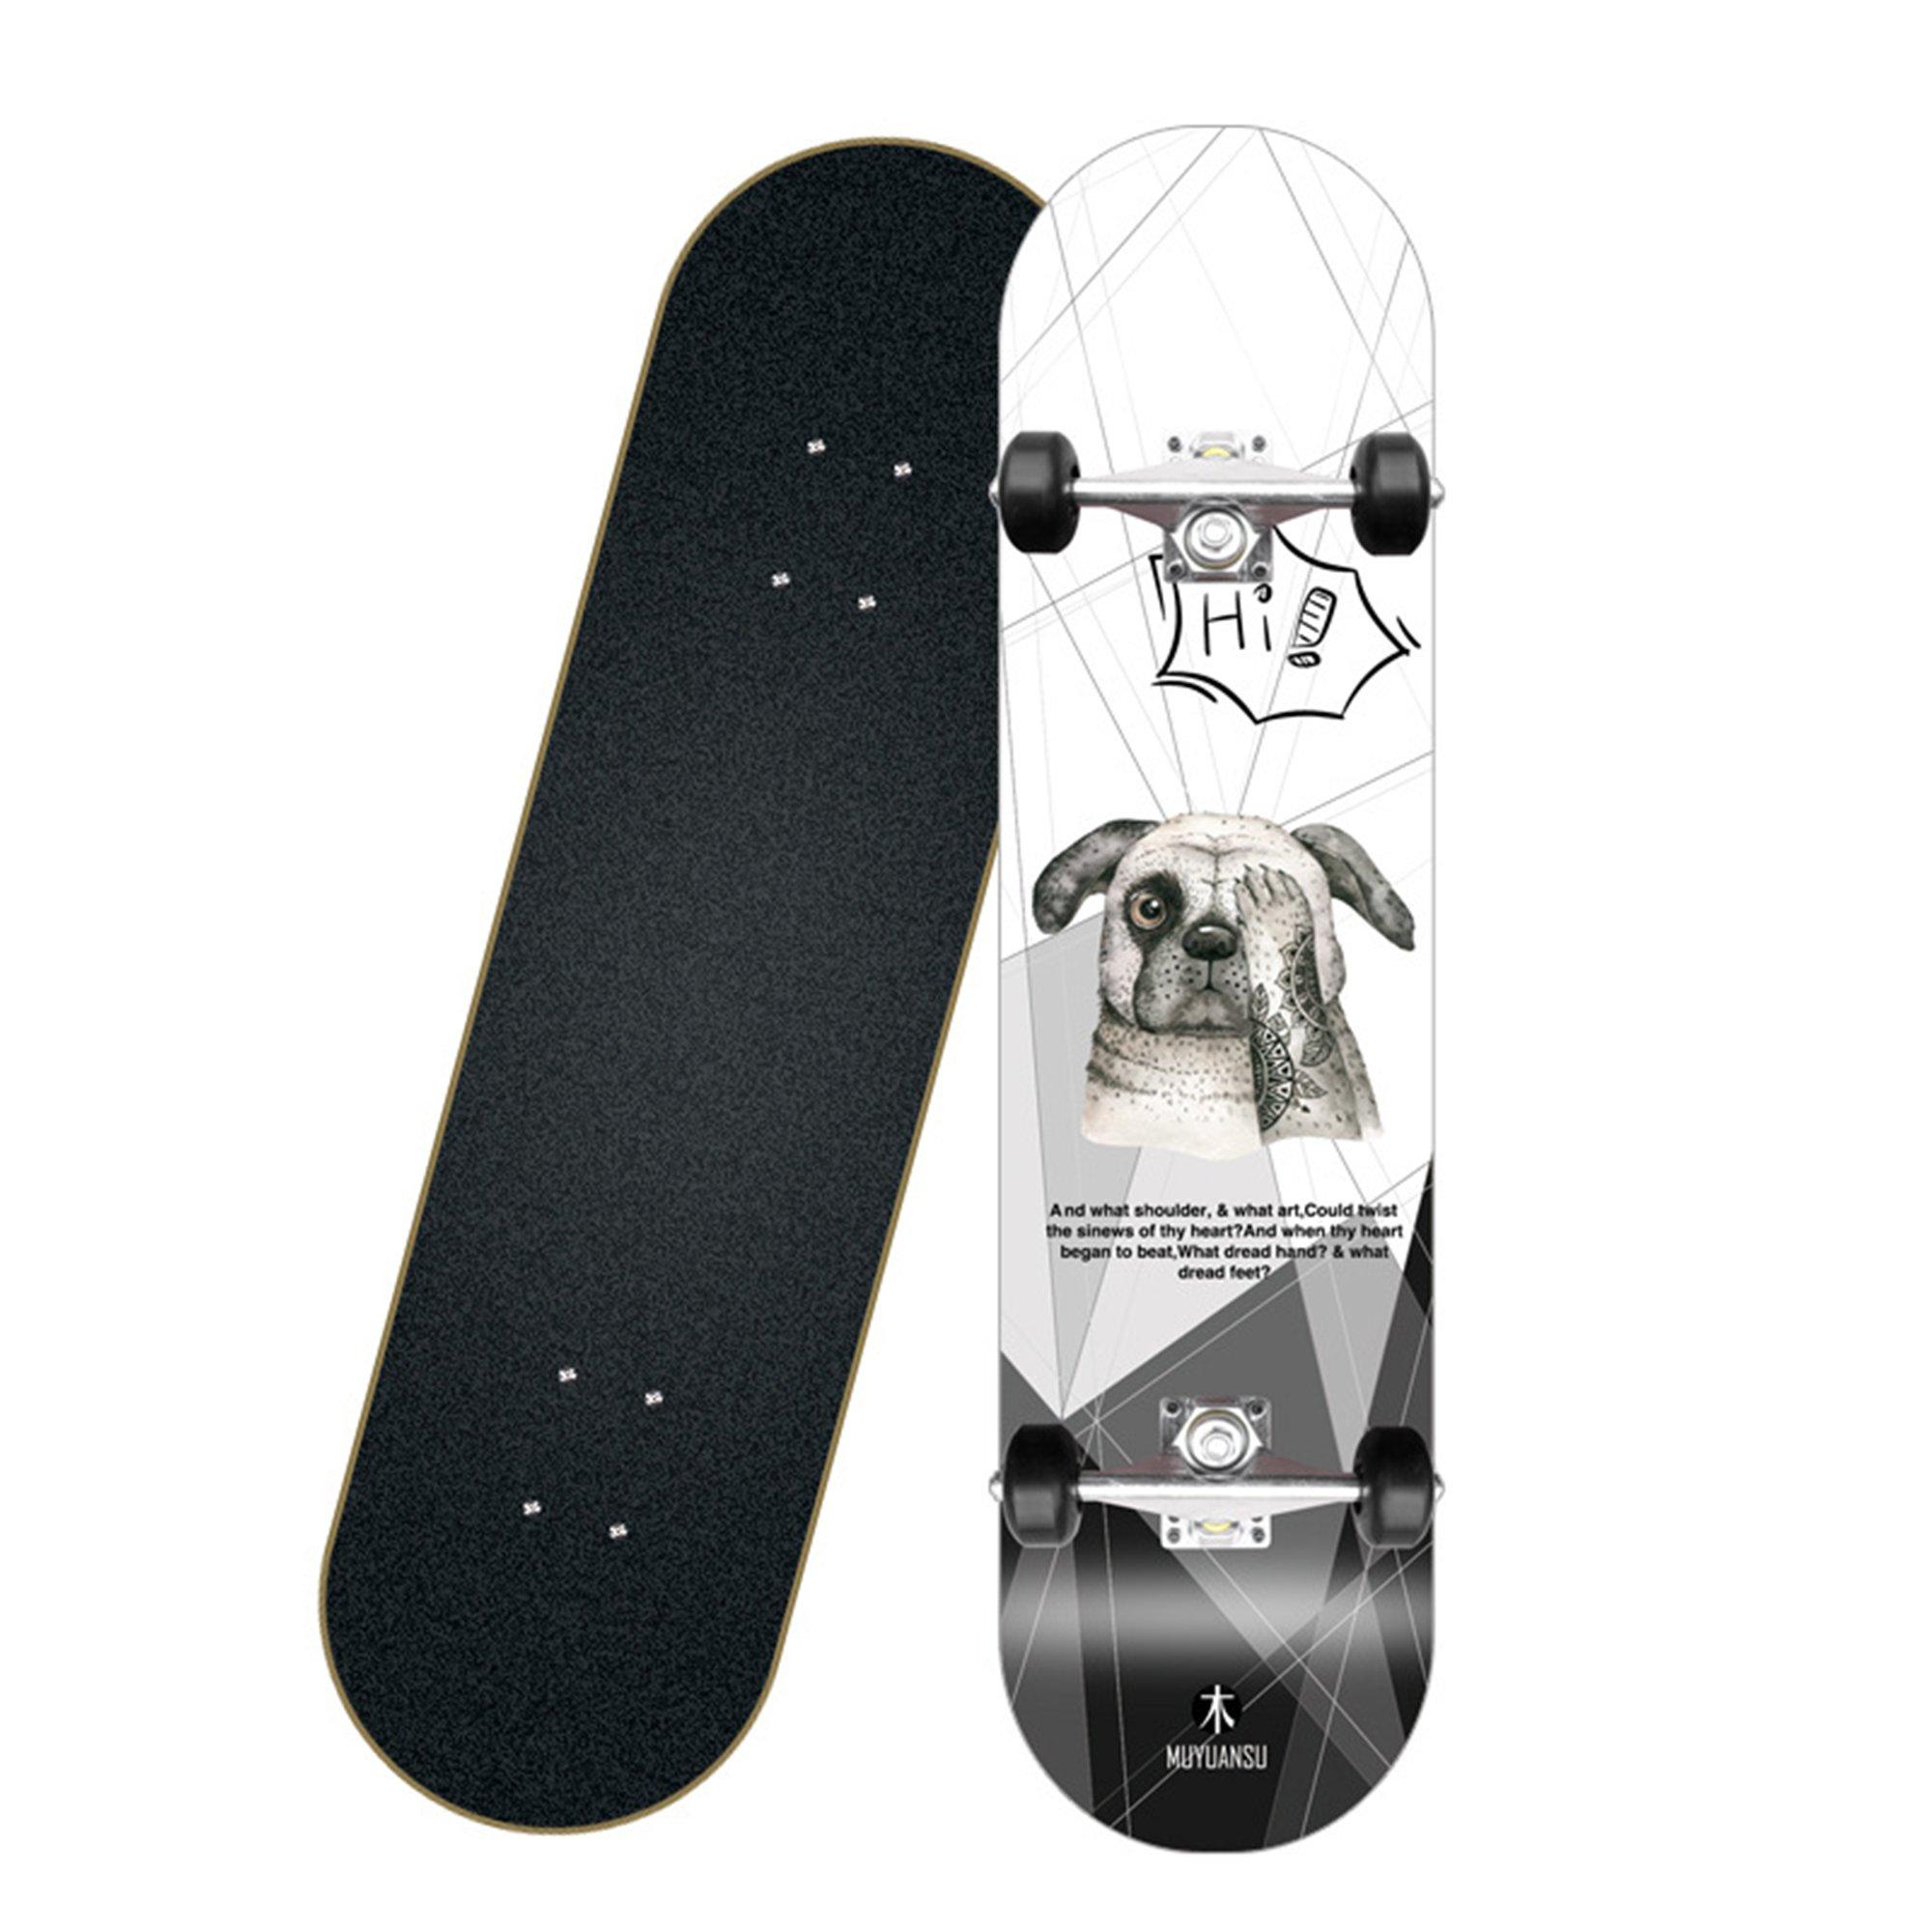 8 Layer Maple Wood Deck Skateboard - Yellow Hexagram